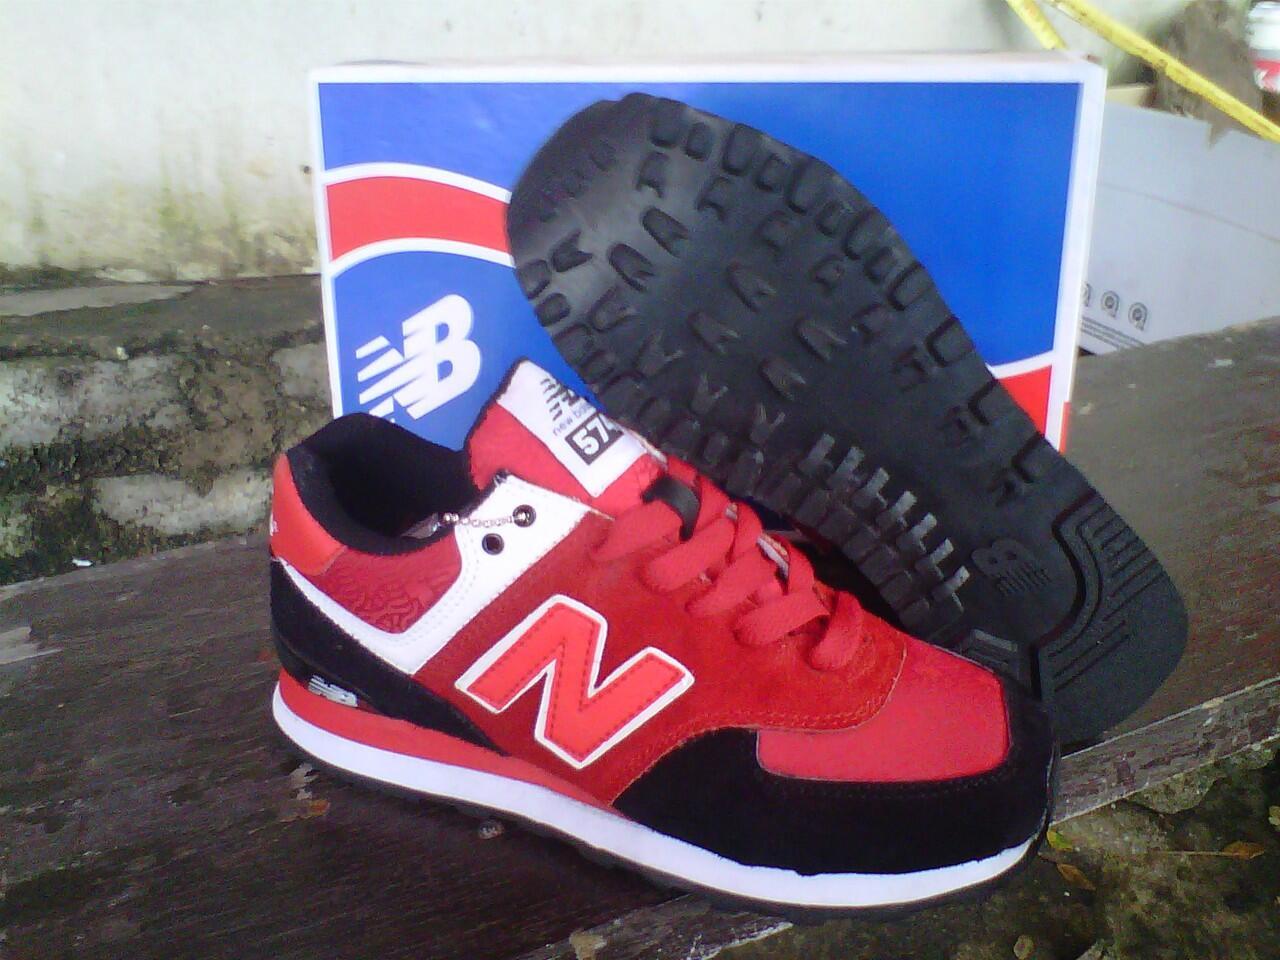 [WTS] Ready stok sepatu New Balance 574 Encap KW Vietnam... TERMURAH...!!!